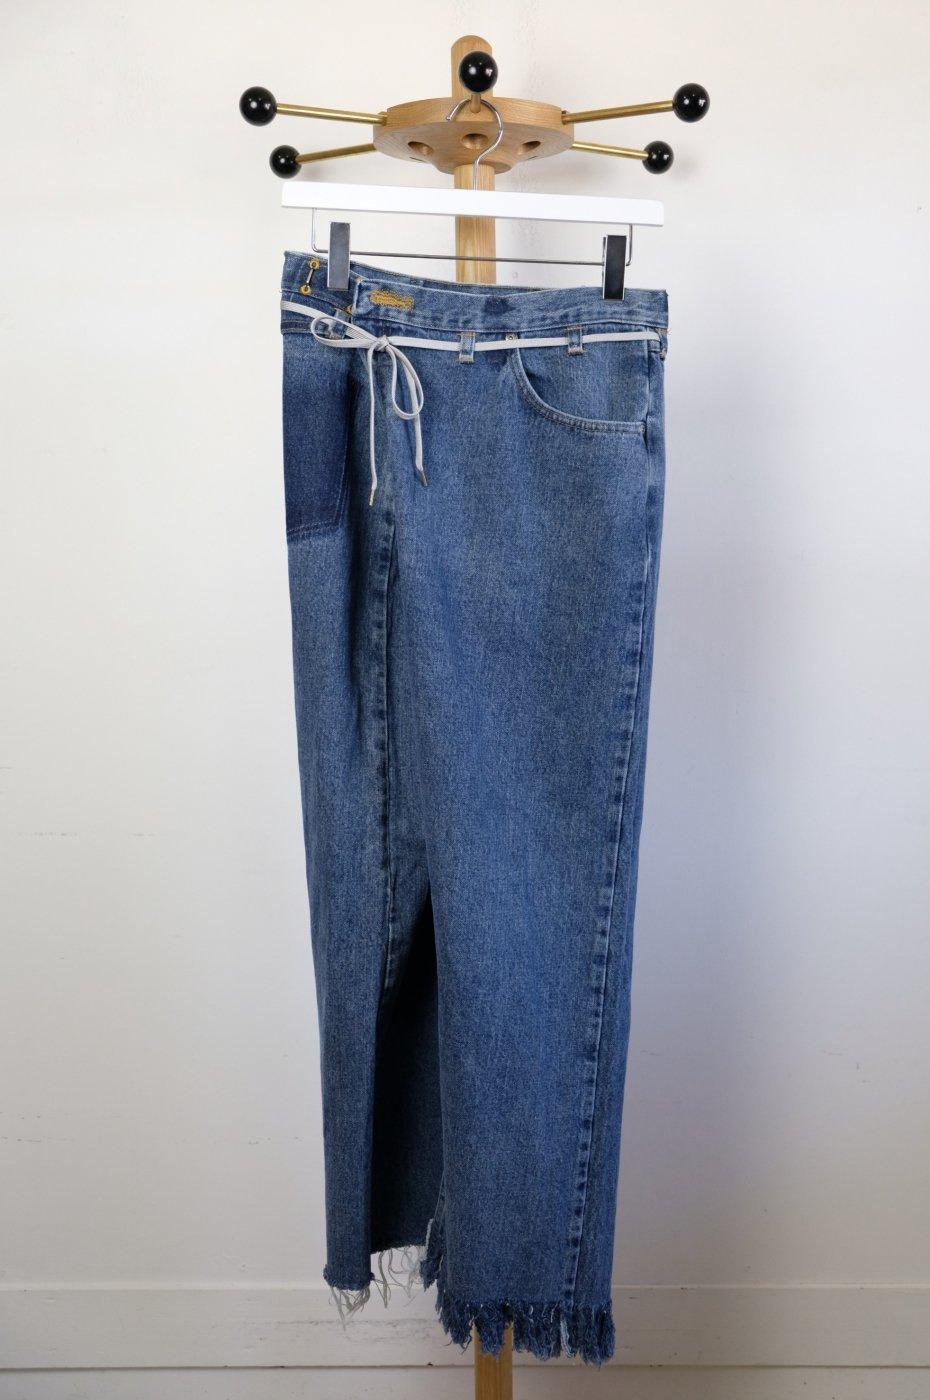 MAISON EUREKA メゾンエウレカ-VINTAGE REWORK BIGGY PANTS-BLUE-#4